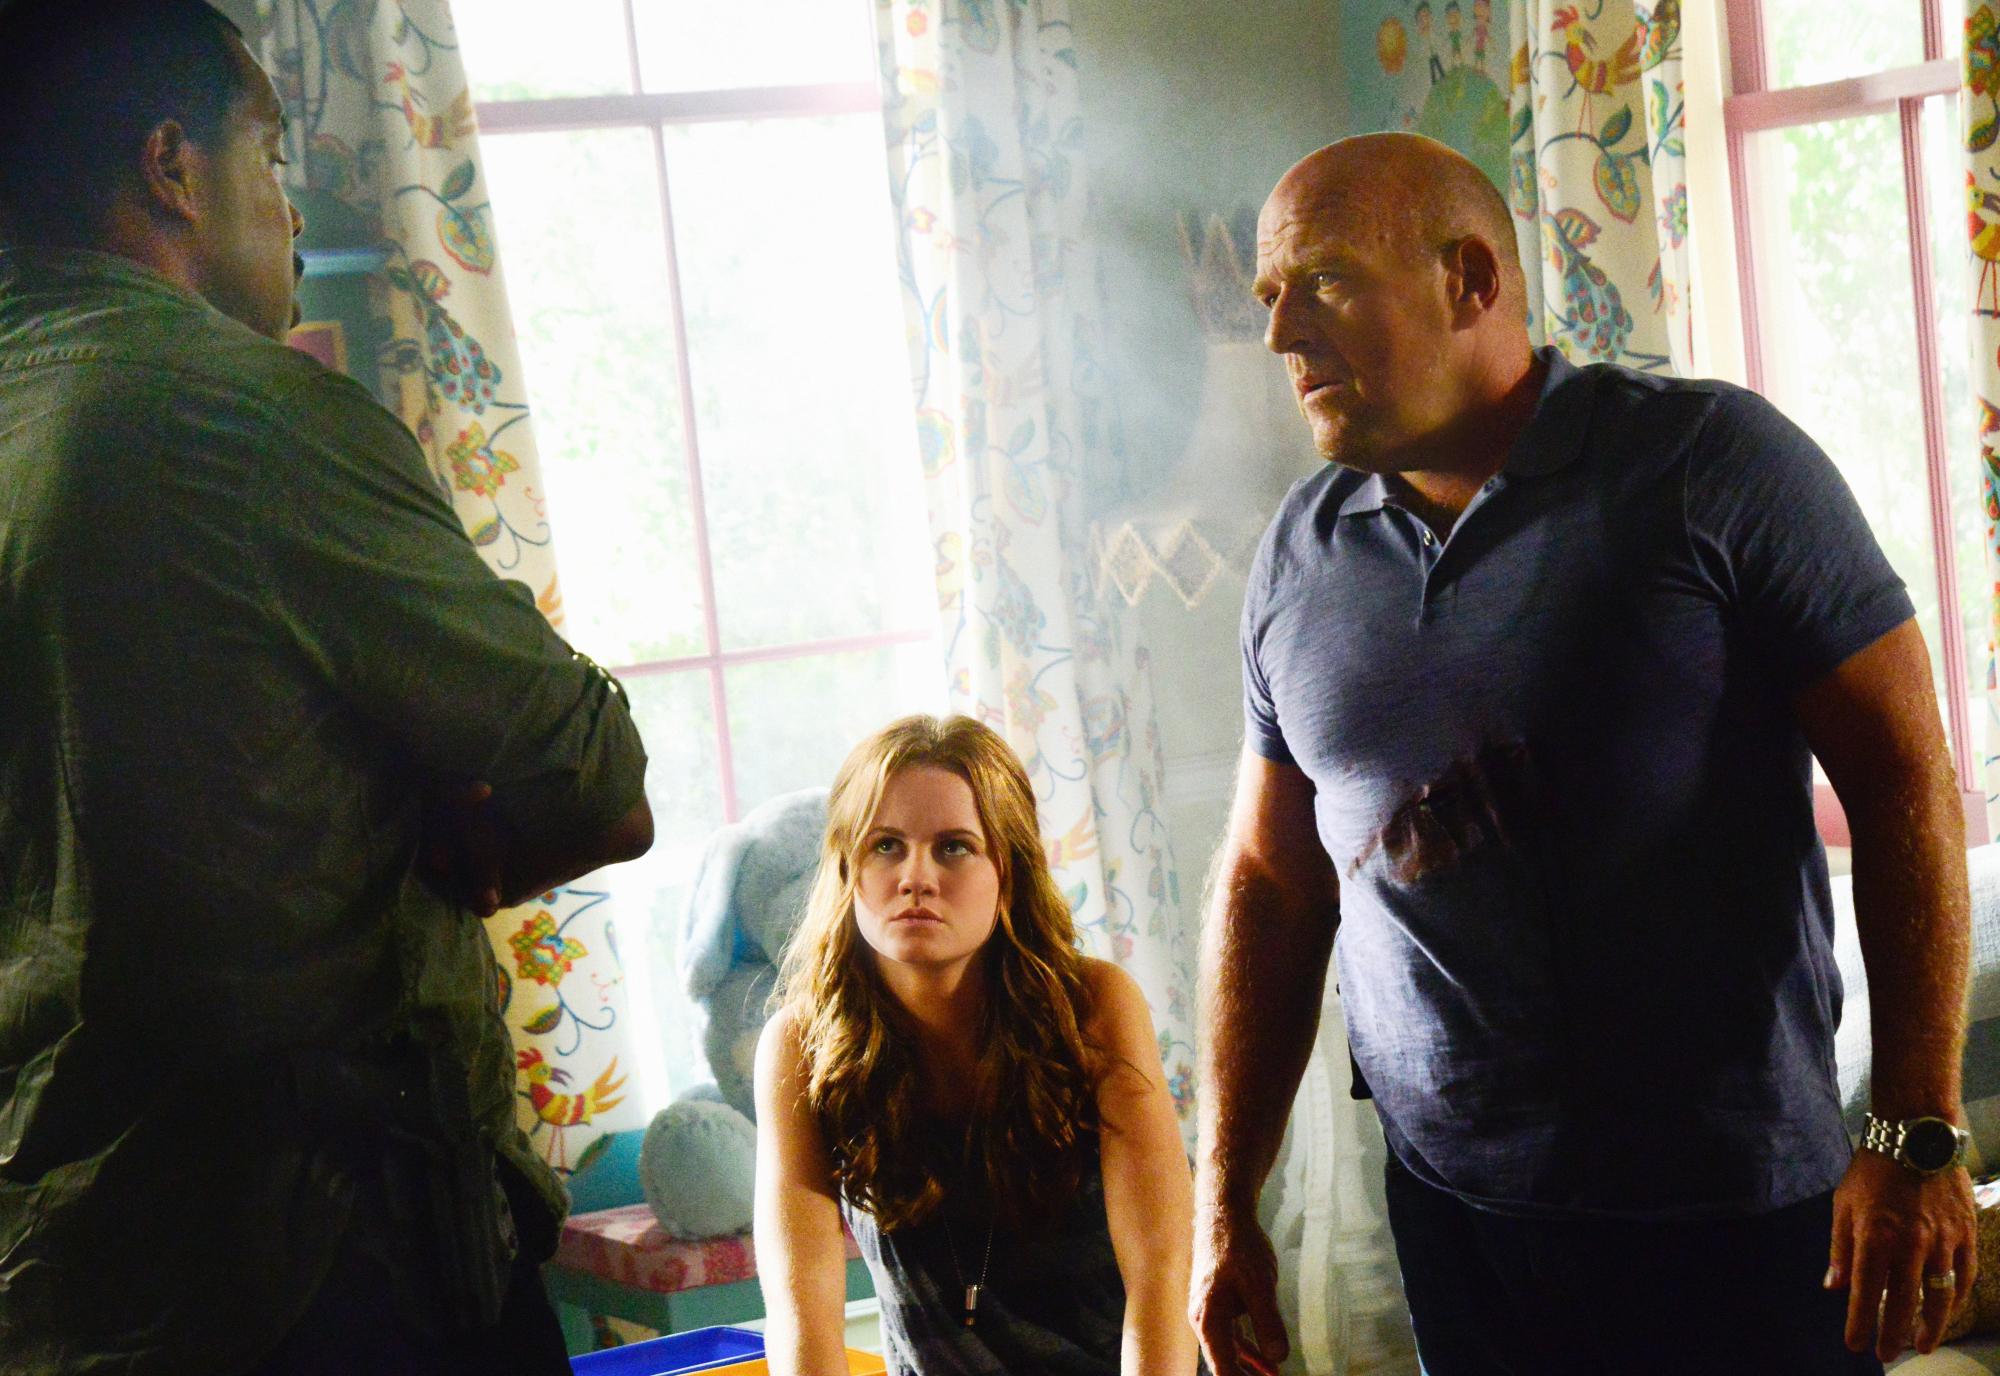 Eriq La Salle as Hektor Martin, Mackenzie Lintz as Norrie Calvert-Hill, and Dean Norris as James